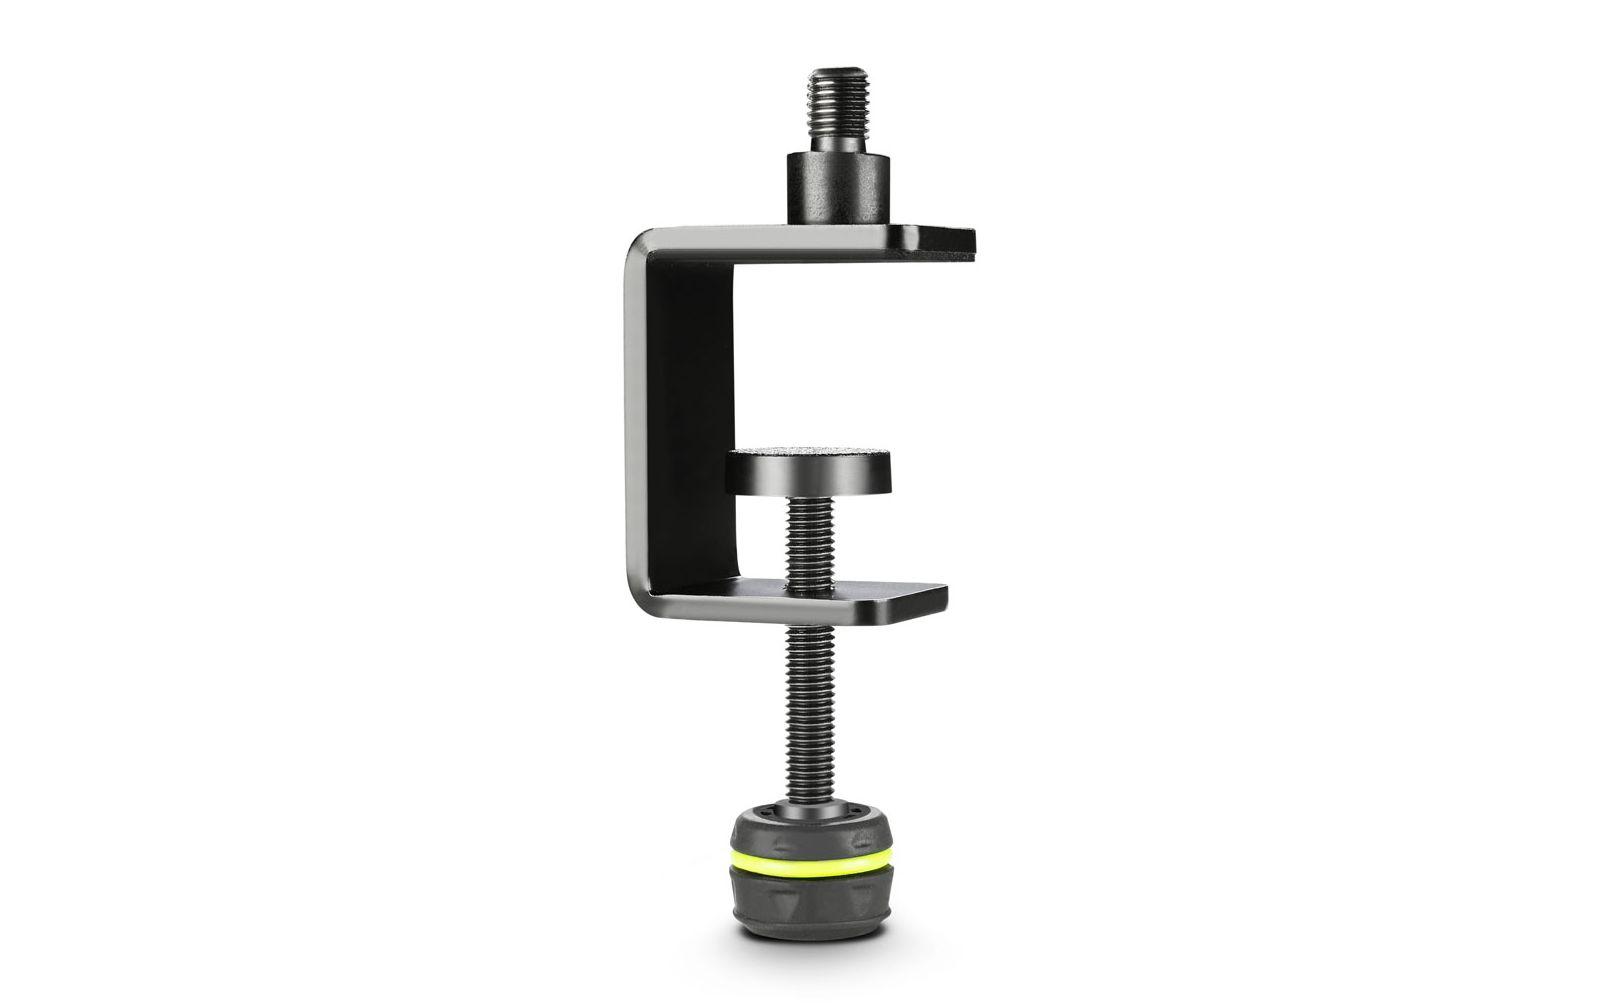 gravity-mstm-1-b-tischklemme-fa-r-mikrofone